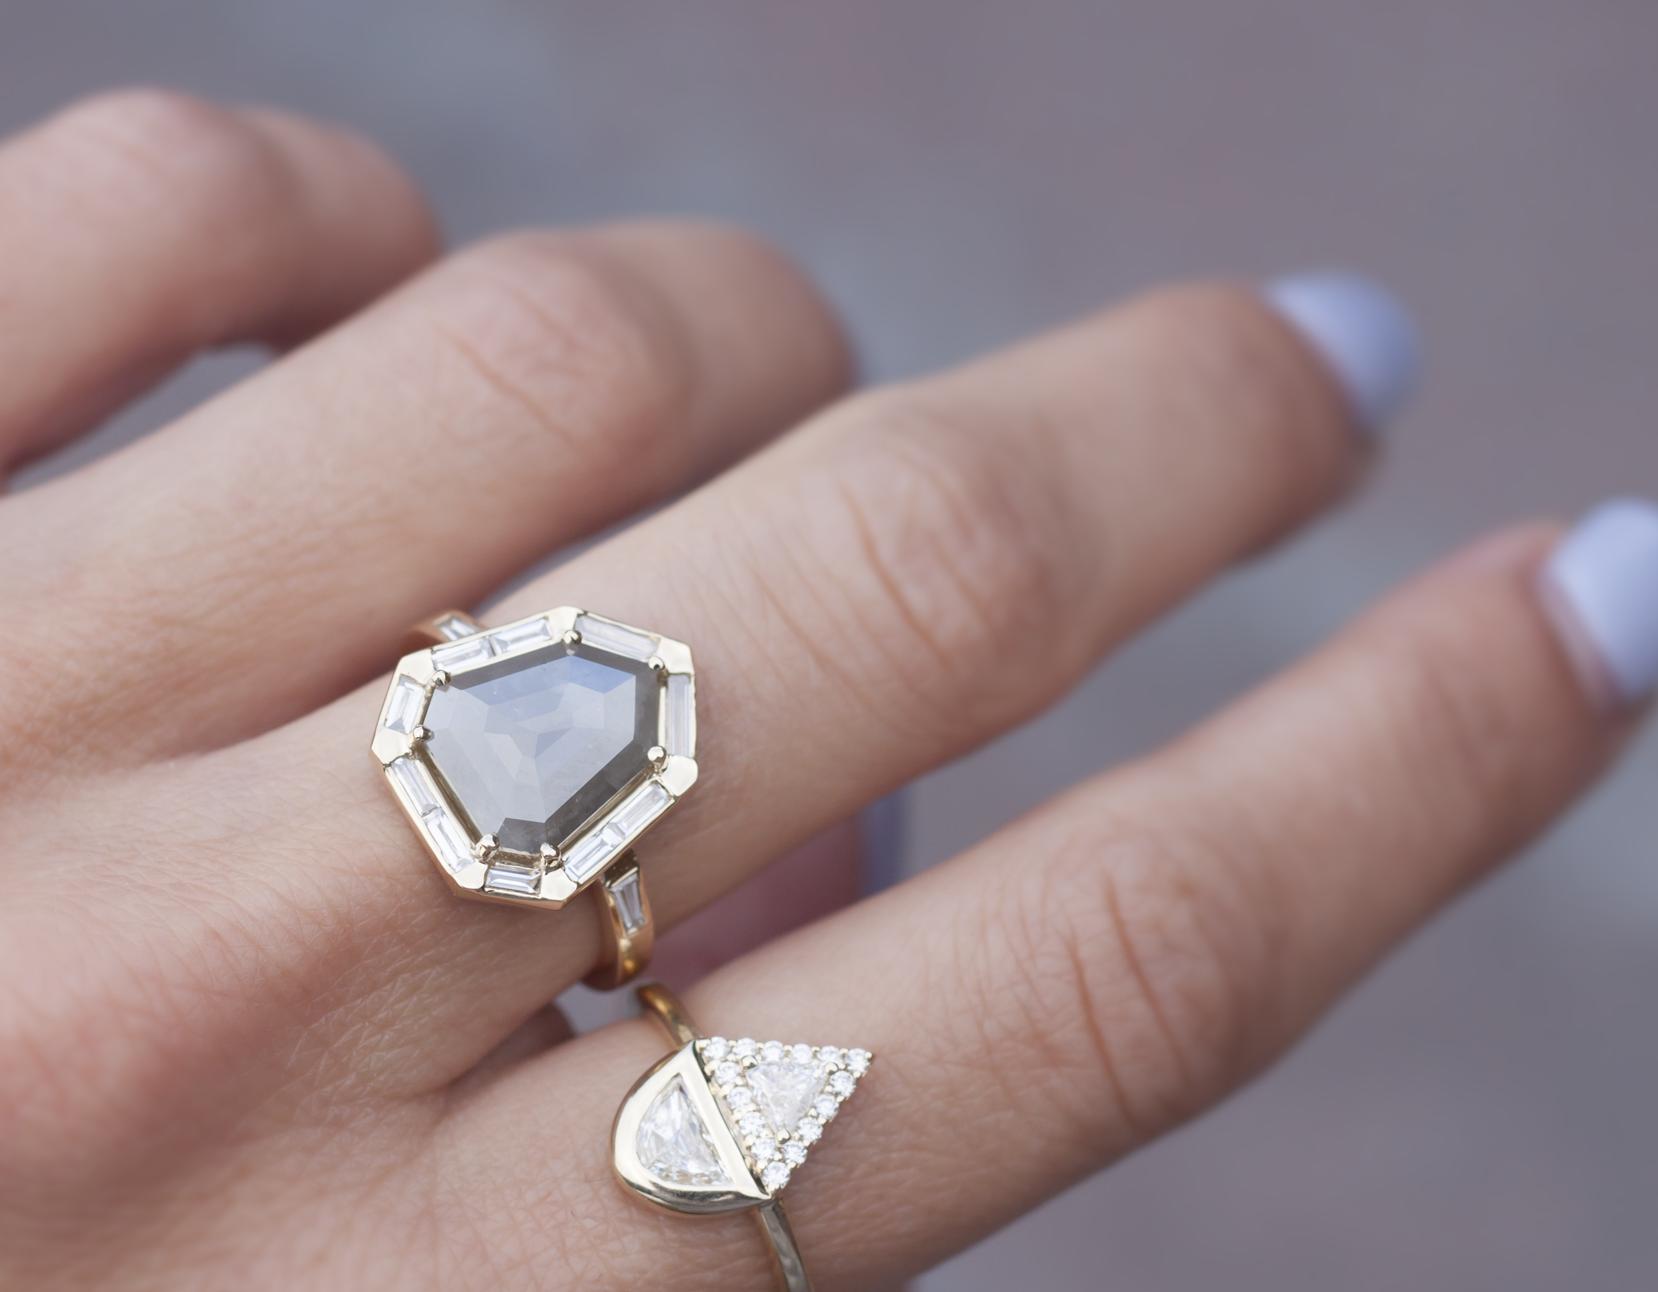 Shield Cut Diamond Engagement Ring - Anastassia Sel Jewelry